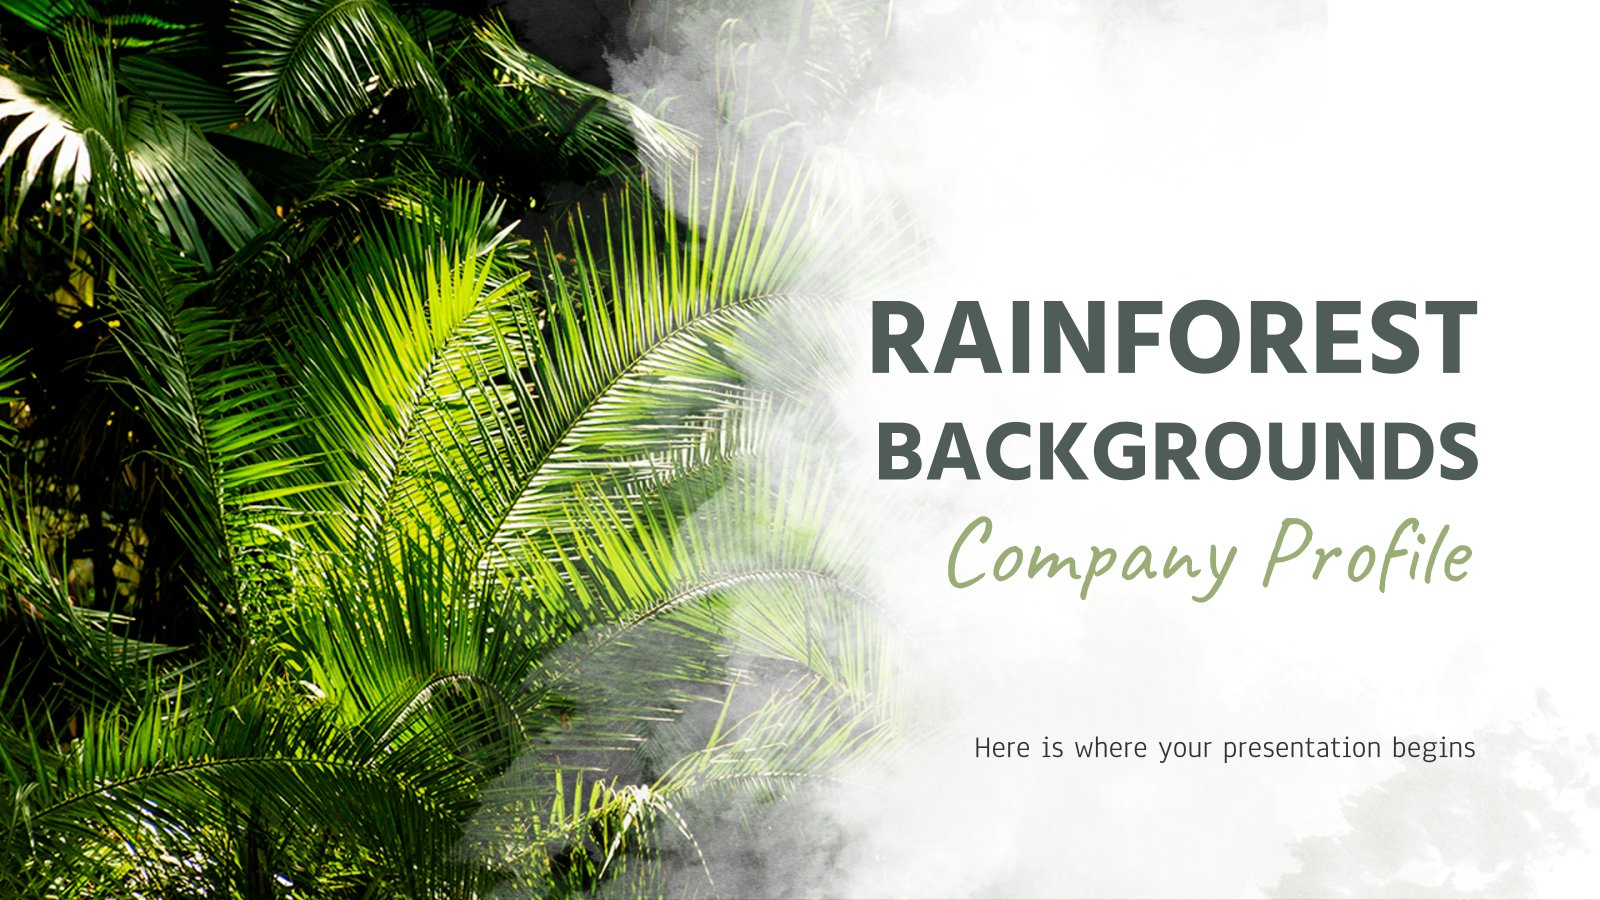 Rainforest Backgrounds Company Profile presentation template